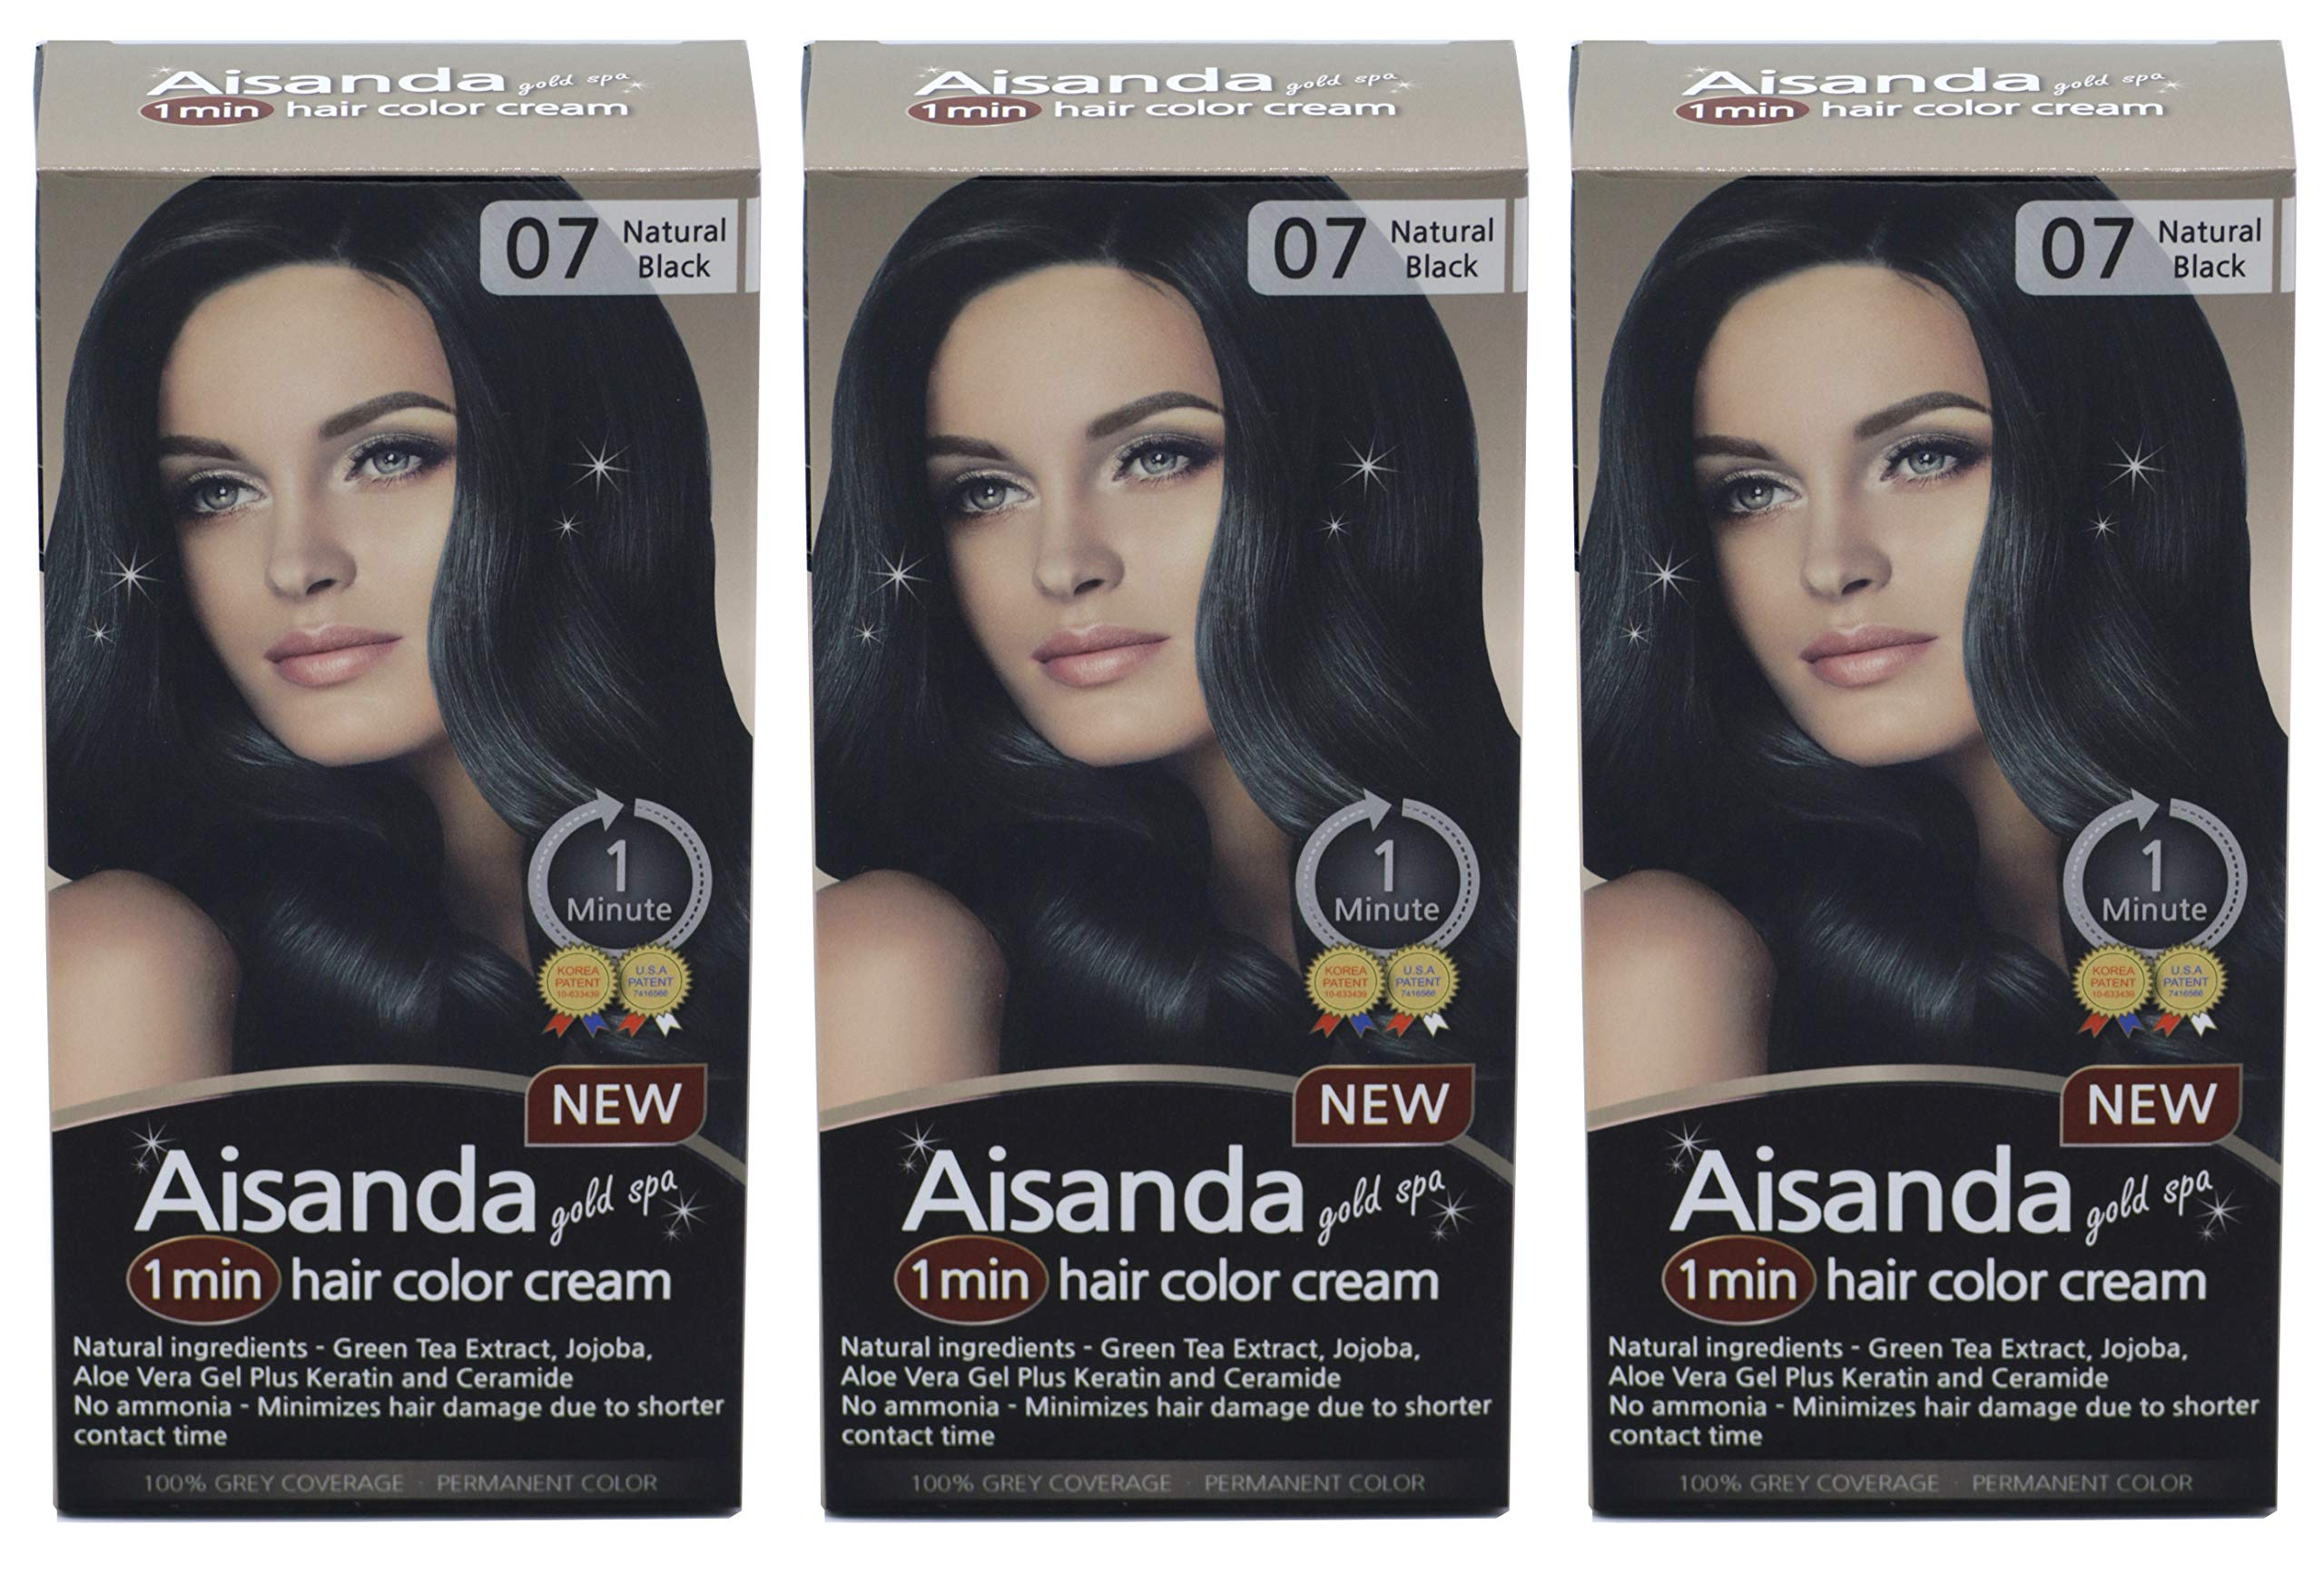 Aisanda/Assanta Gold Spa 1 Minute Hair Color Cream, Fast Natural Hair Dye For Women & Men With Herbal Ingredients, Ammonia Free (3Pack60g, Natural Black) by Assanta